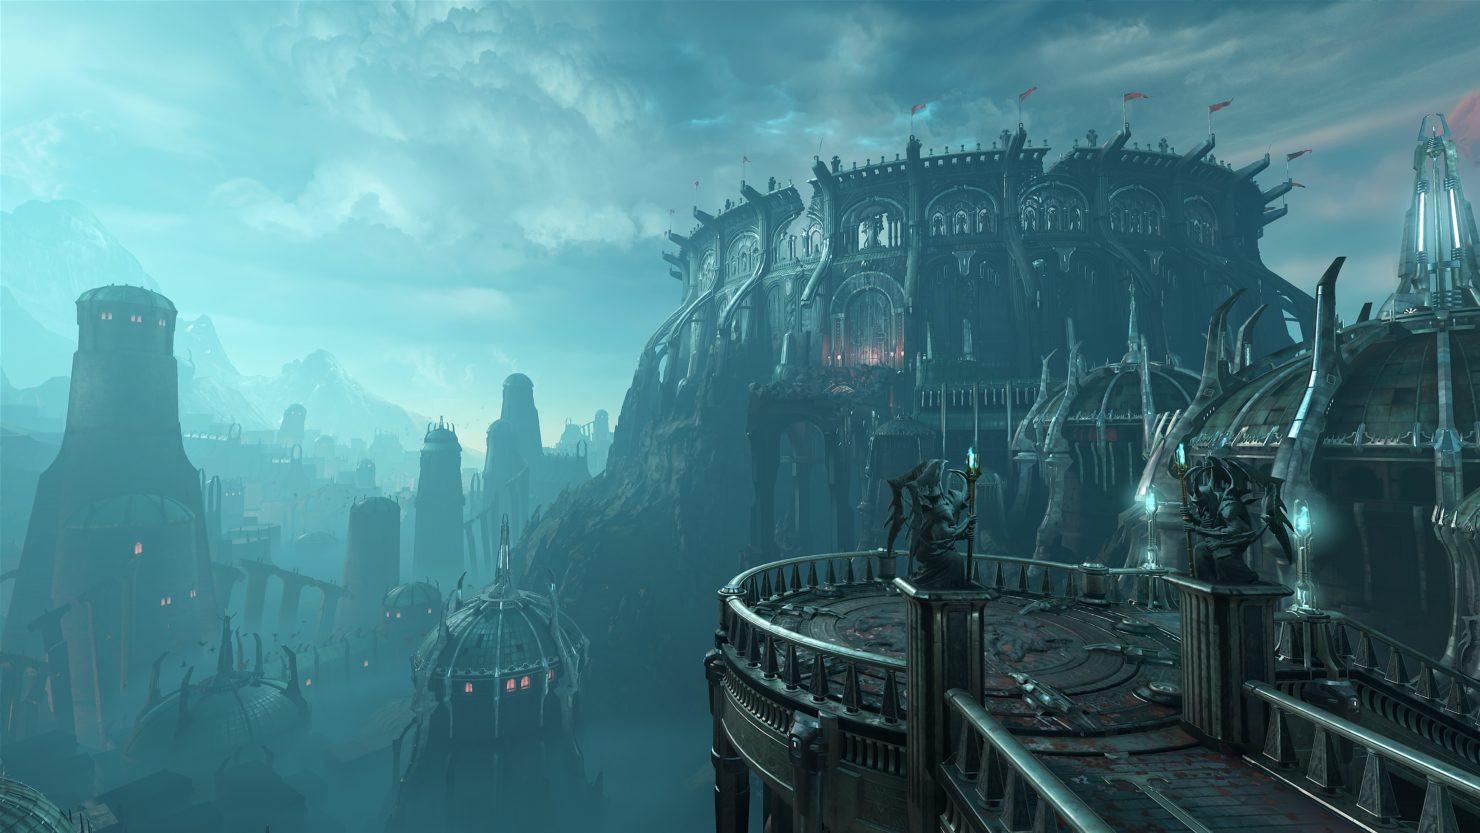 Bethesda Announces Doom Eternal At QuakeCon 2018 - Reveals